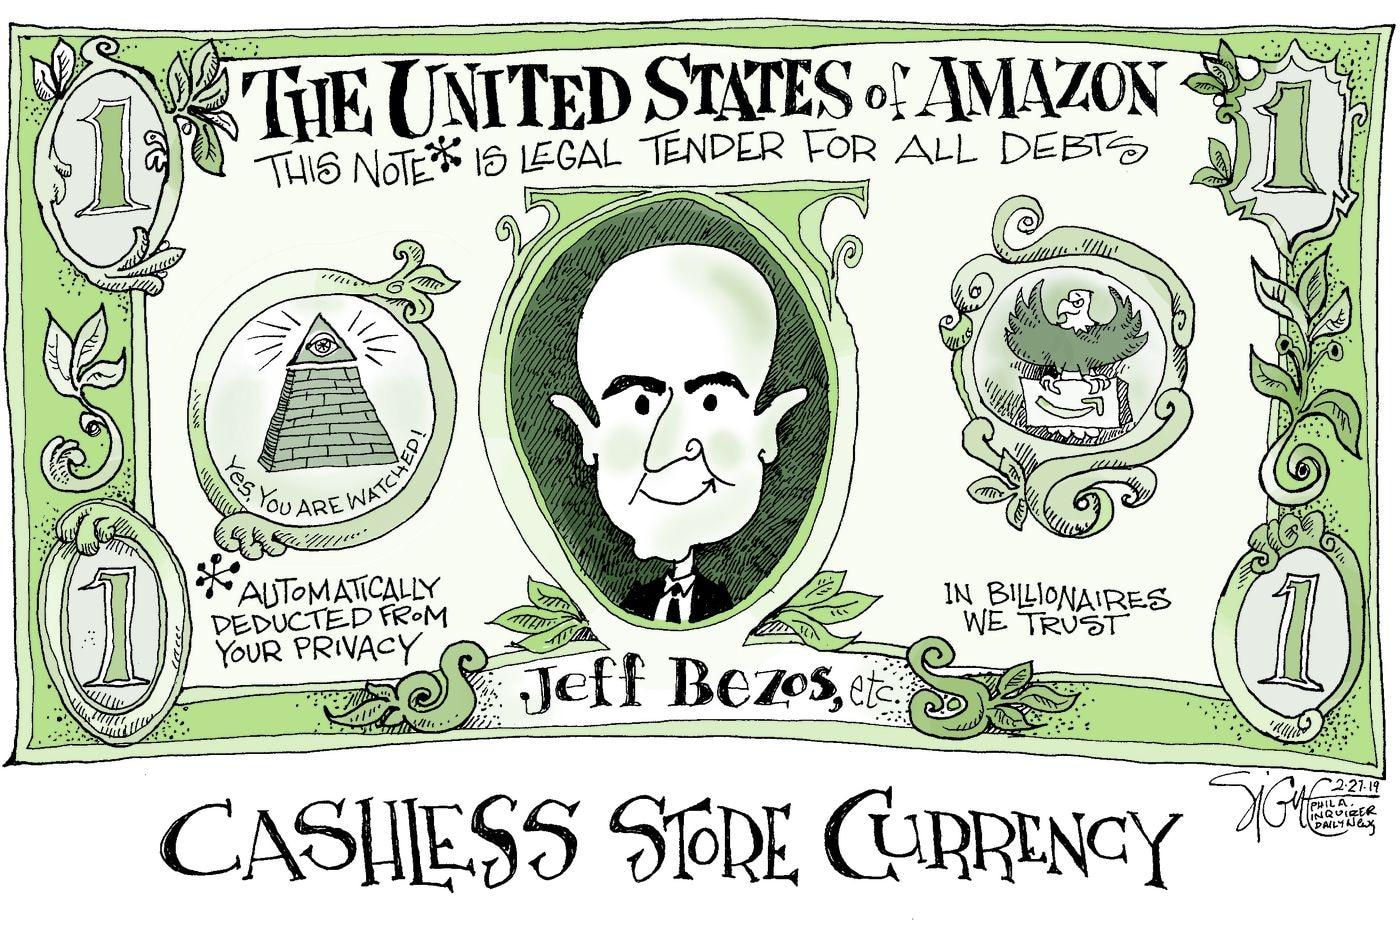 Political Cartoon: Amazon cashless stores